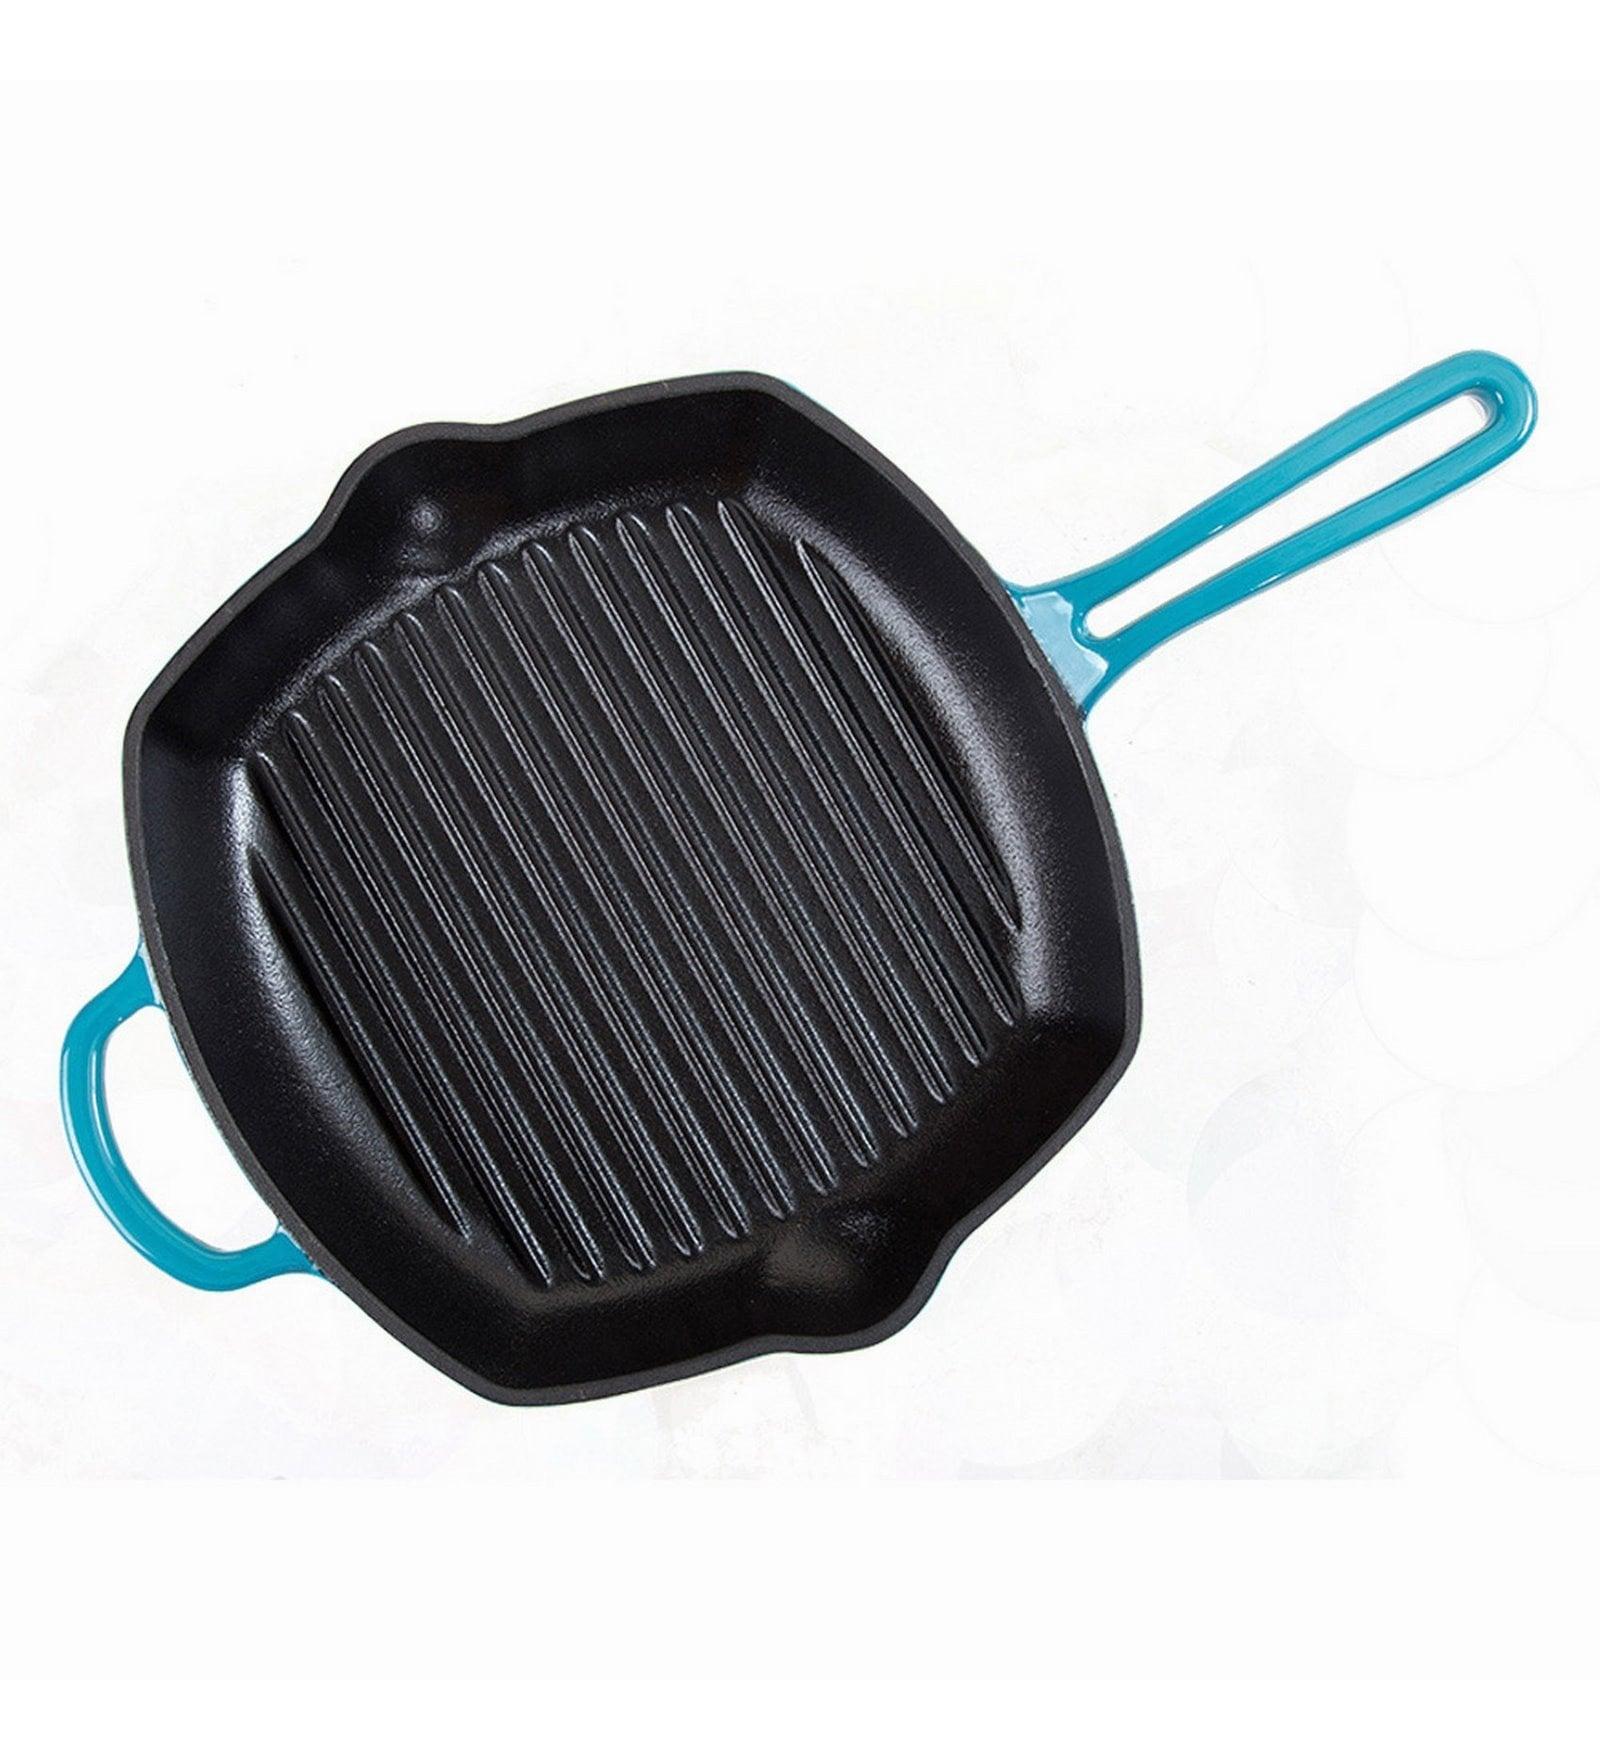 Wonderchef Cast-Iron Blue Sandwich & Grill Maker